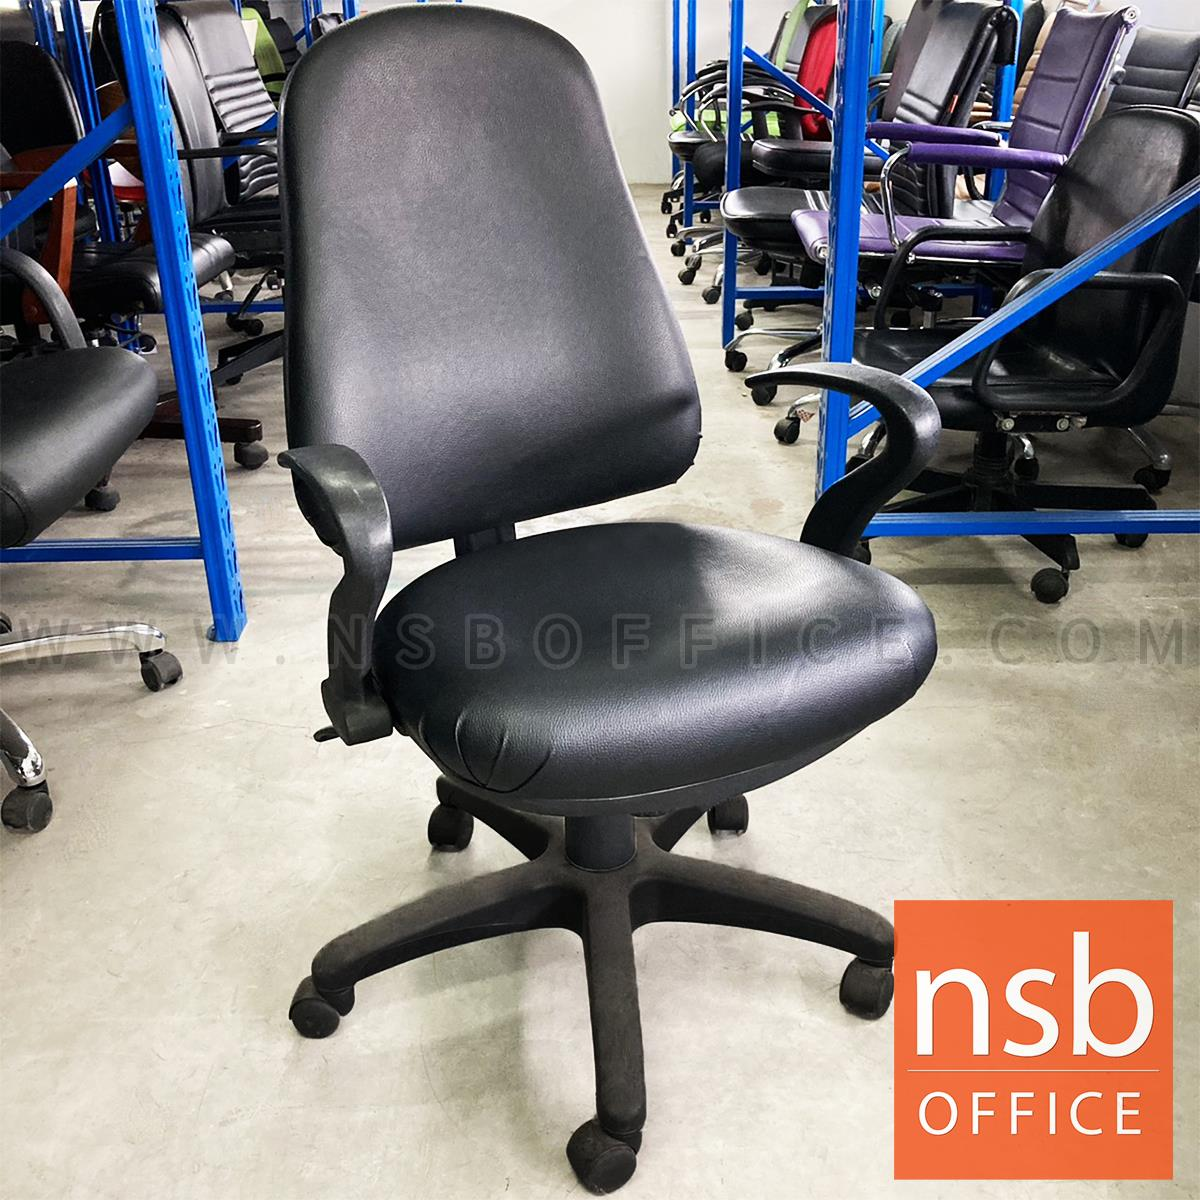 L02A376:เก้าอี้สำนักงาน    โช๊คแก๊ส มีก้อนโยก ขาพลาสติก